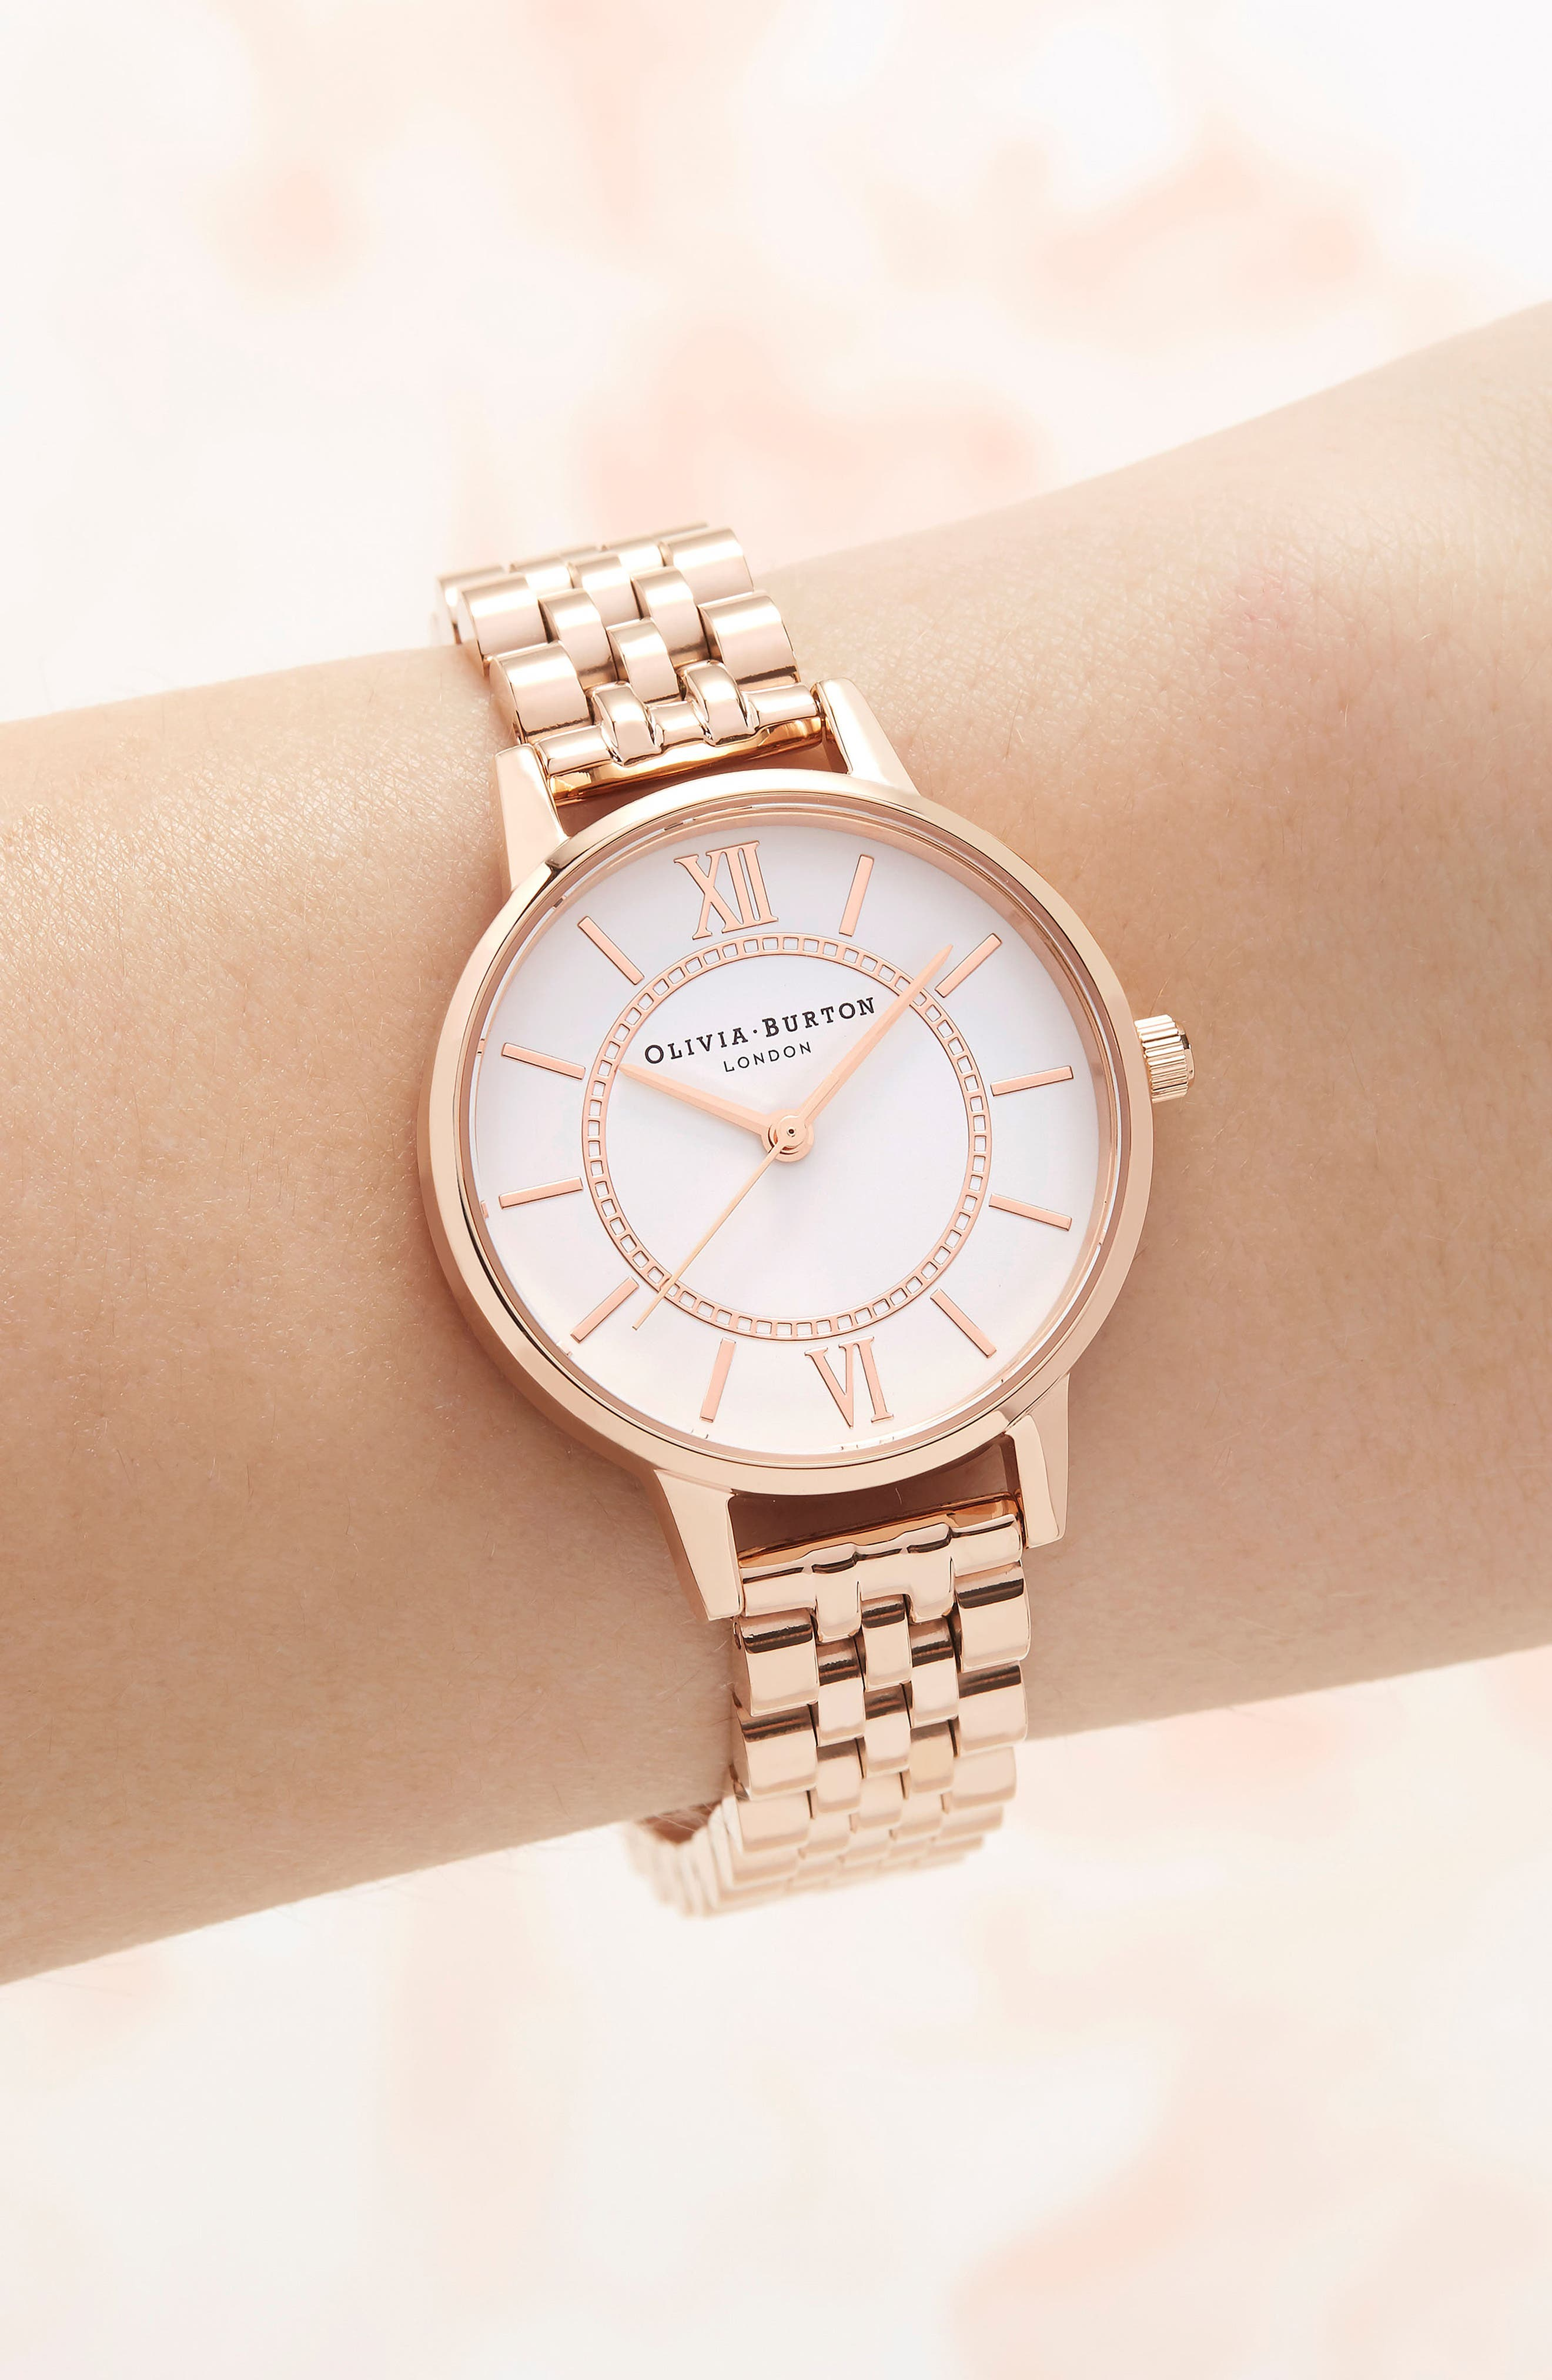 OLIVIA BURTON,                             Wonderland Bracelet Watch, 30mm,                             Alternate thumbnail 2, color,                             ROSE GOLD/ HITE/ ROSE GOLD